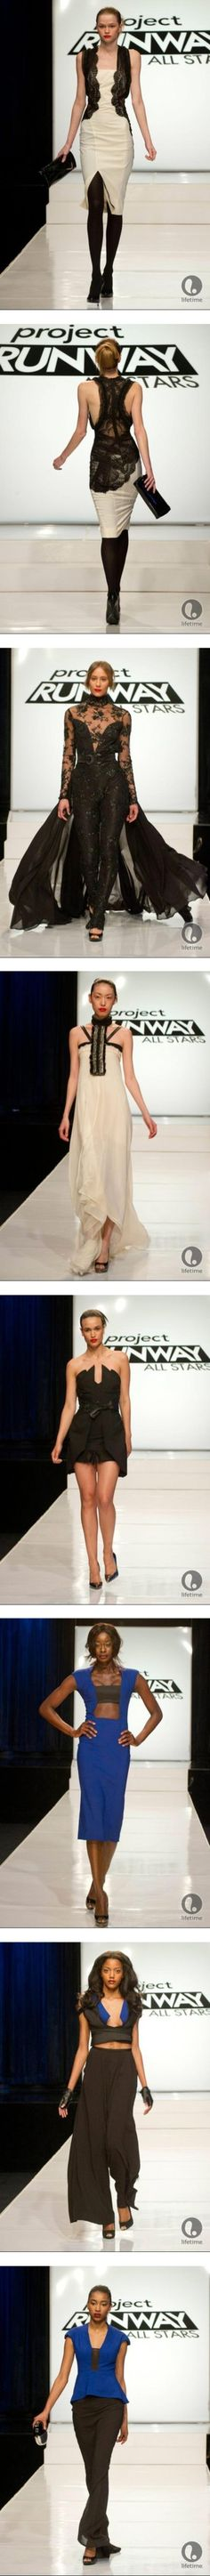 """Project Runway All Stars Season 2 Premiere"" by fashionbeccafabulous ❤ liked on Polyvore"